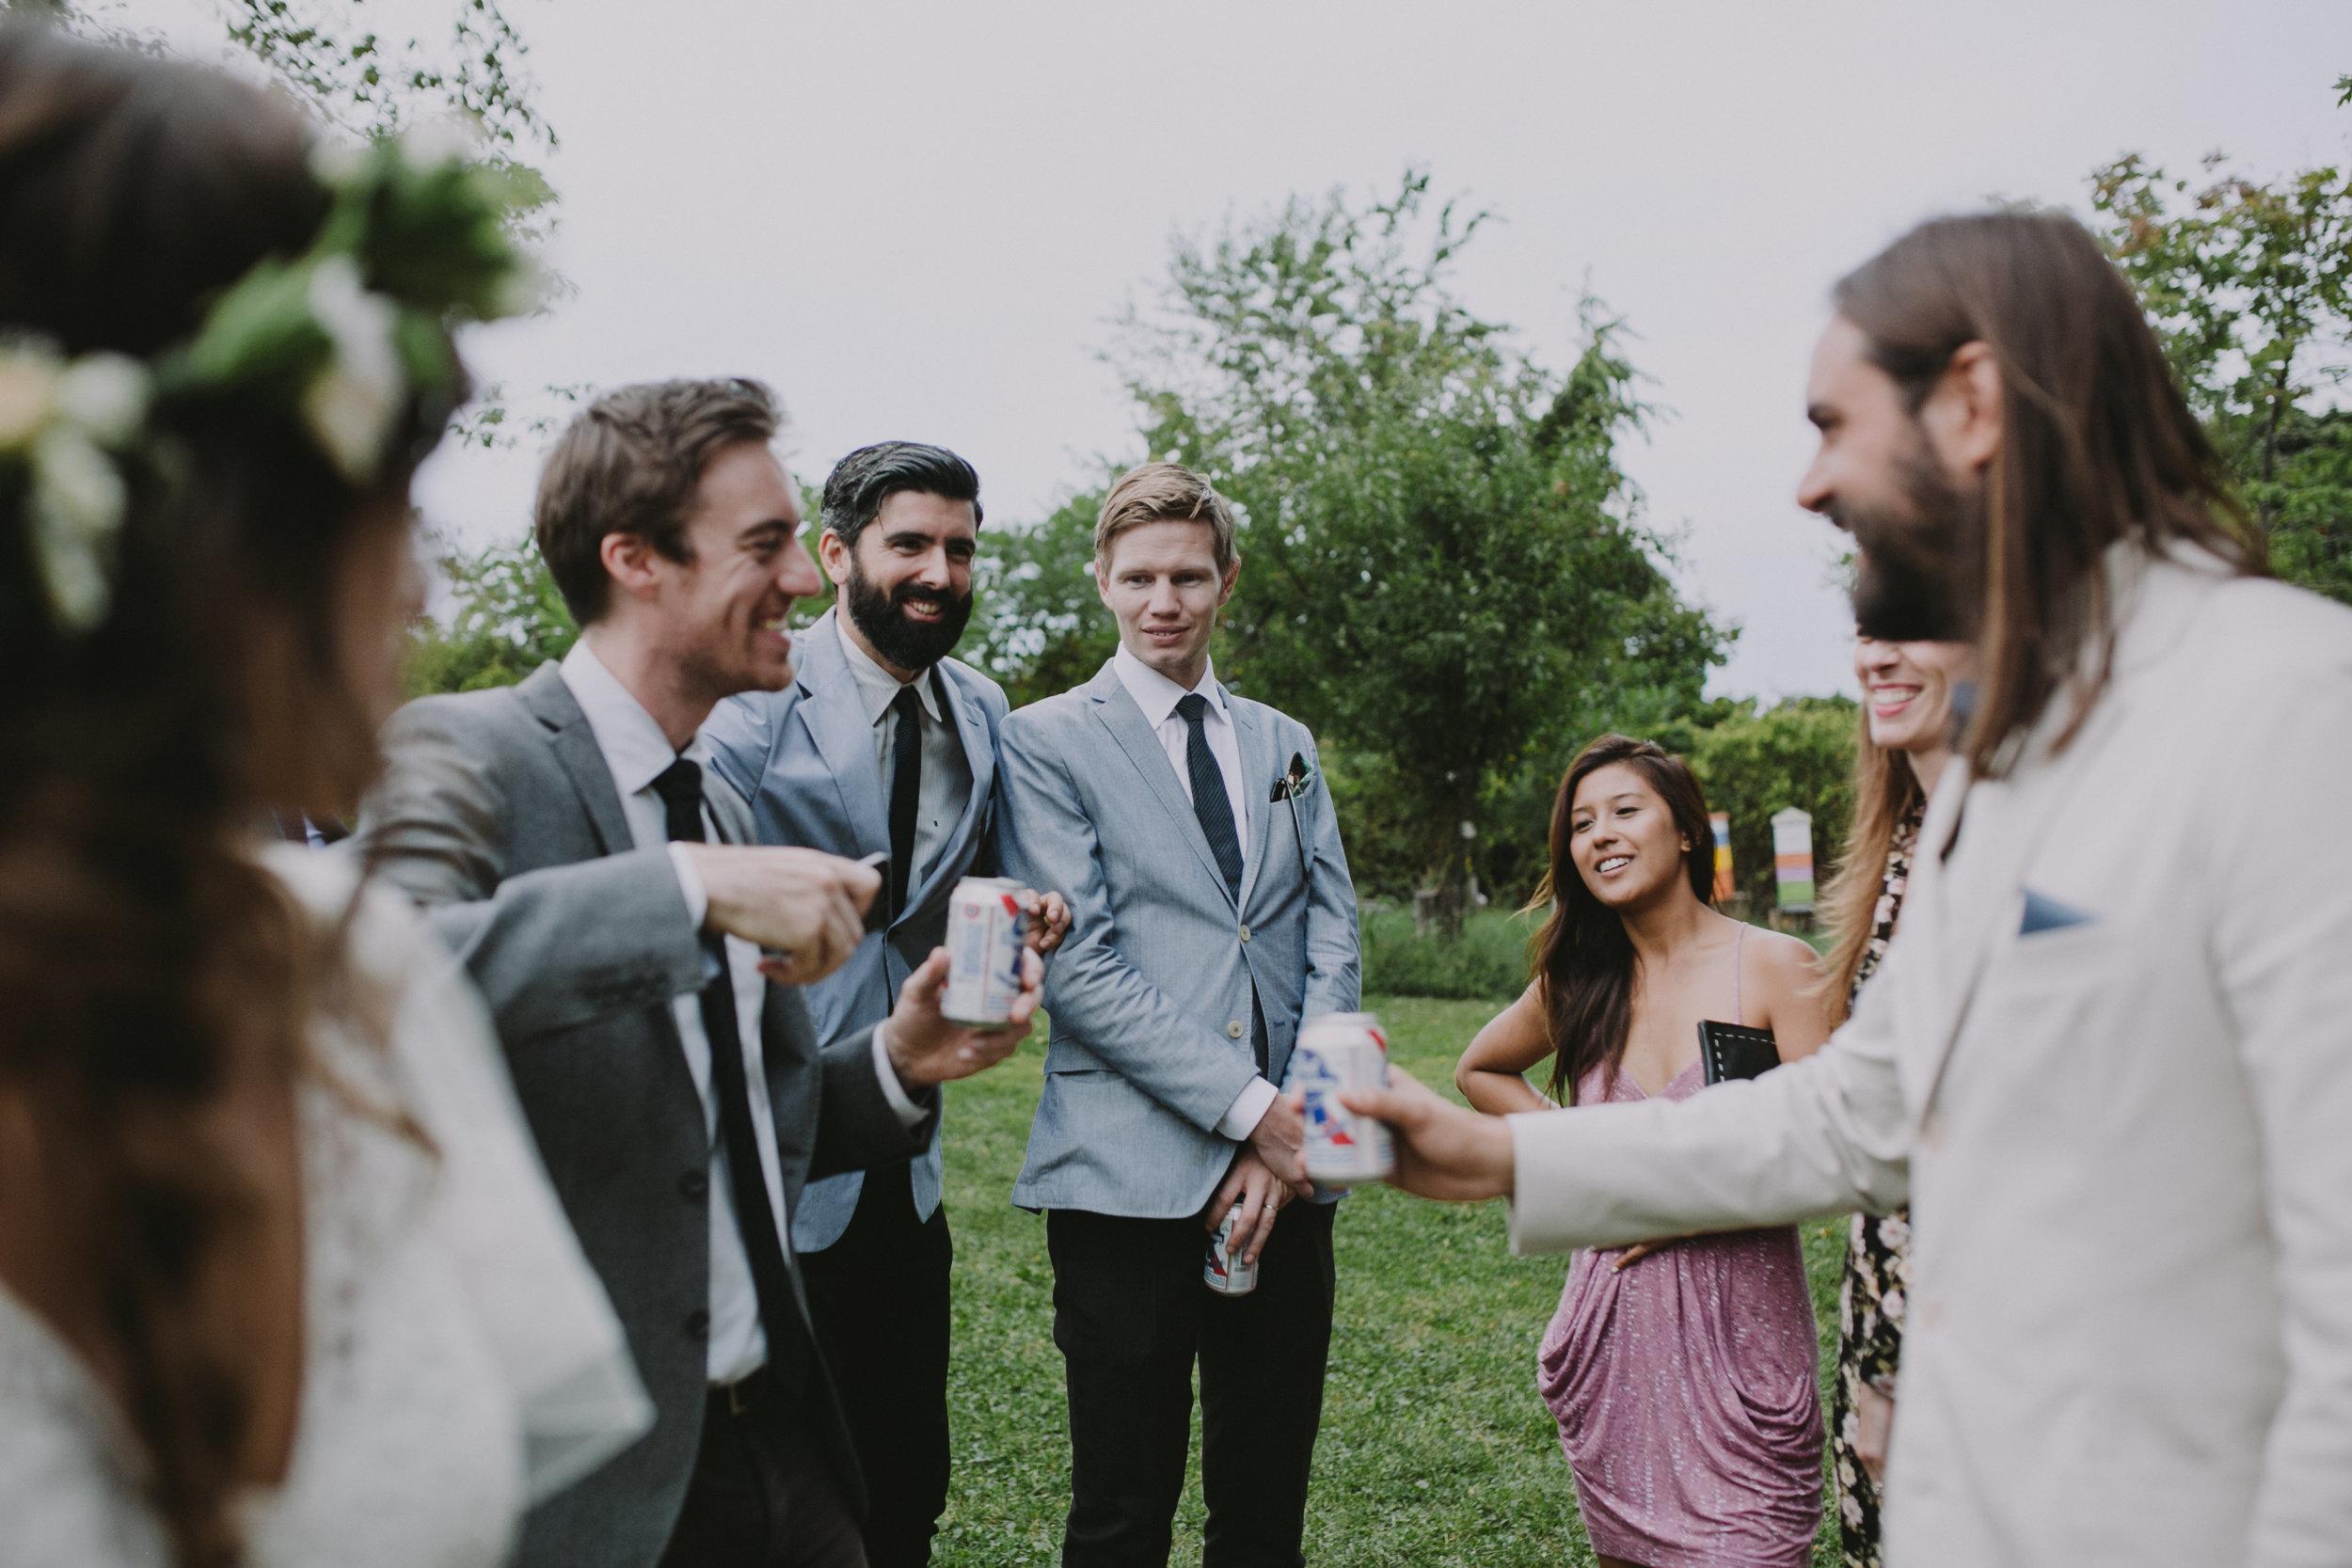 LIBERTY_VIEW_FARM_HIGHLAND_NY_WEDDING_CHELLISE_MICHAEL_PHOTOGRAPHY848.JPG